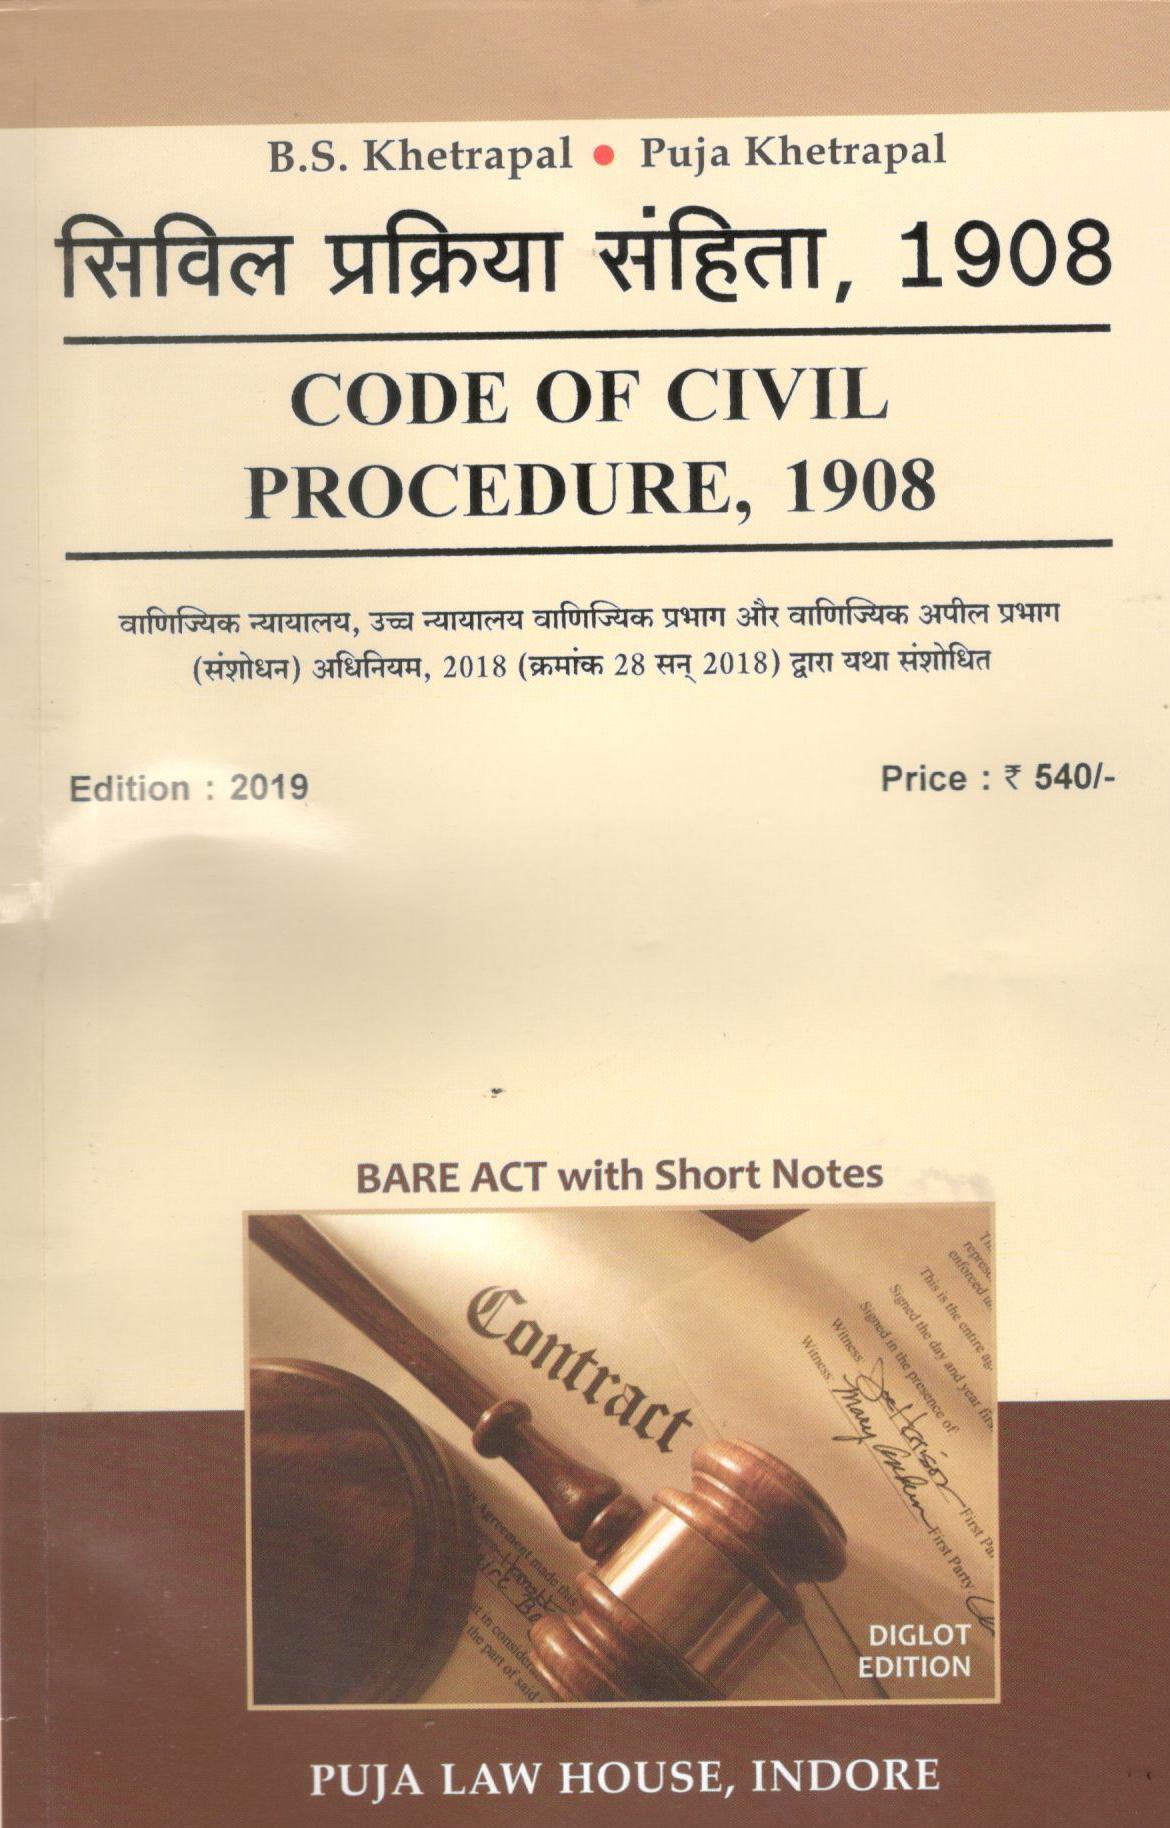 सिविल प�रक�रिया संहिता, 1908 (पेपर बैक) / Civil Procedure Code, 1908 (Paperback)